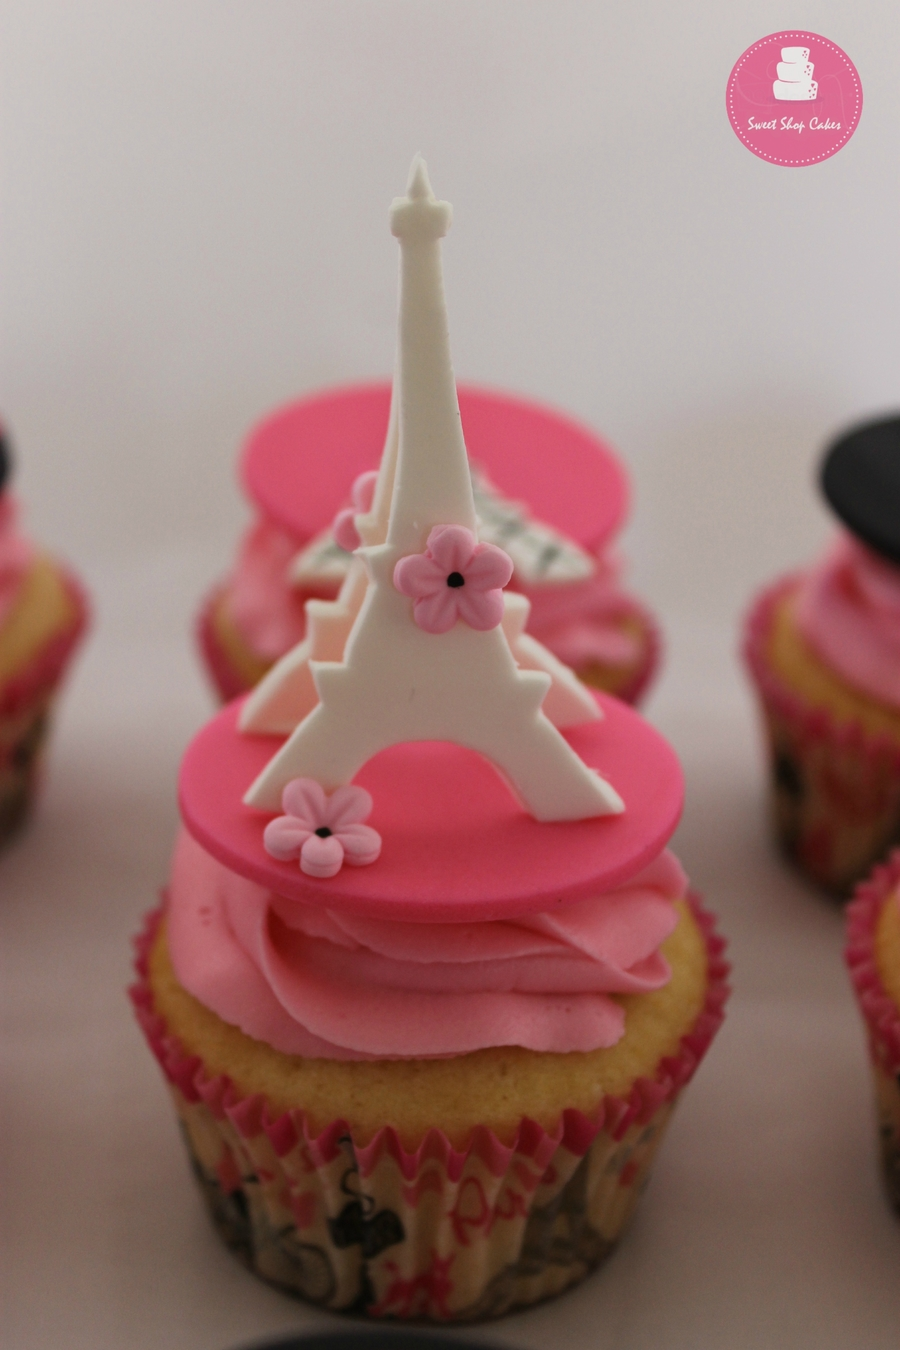 iy4Q9oaw6T-paris-themed-cupcakes_900.jpg